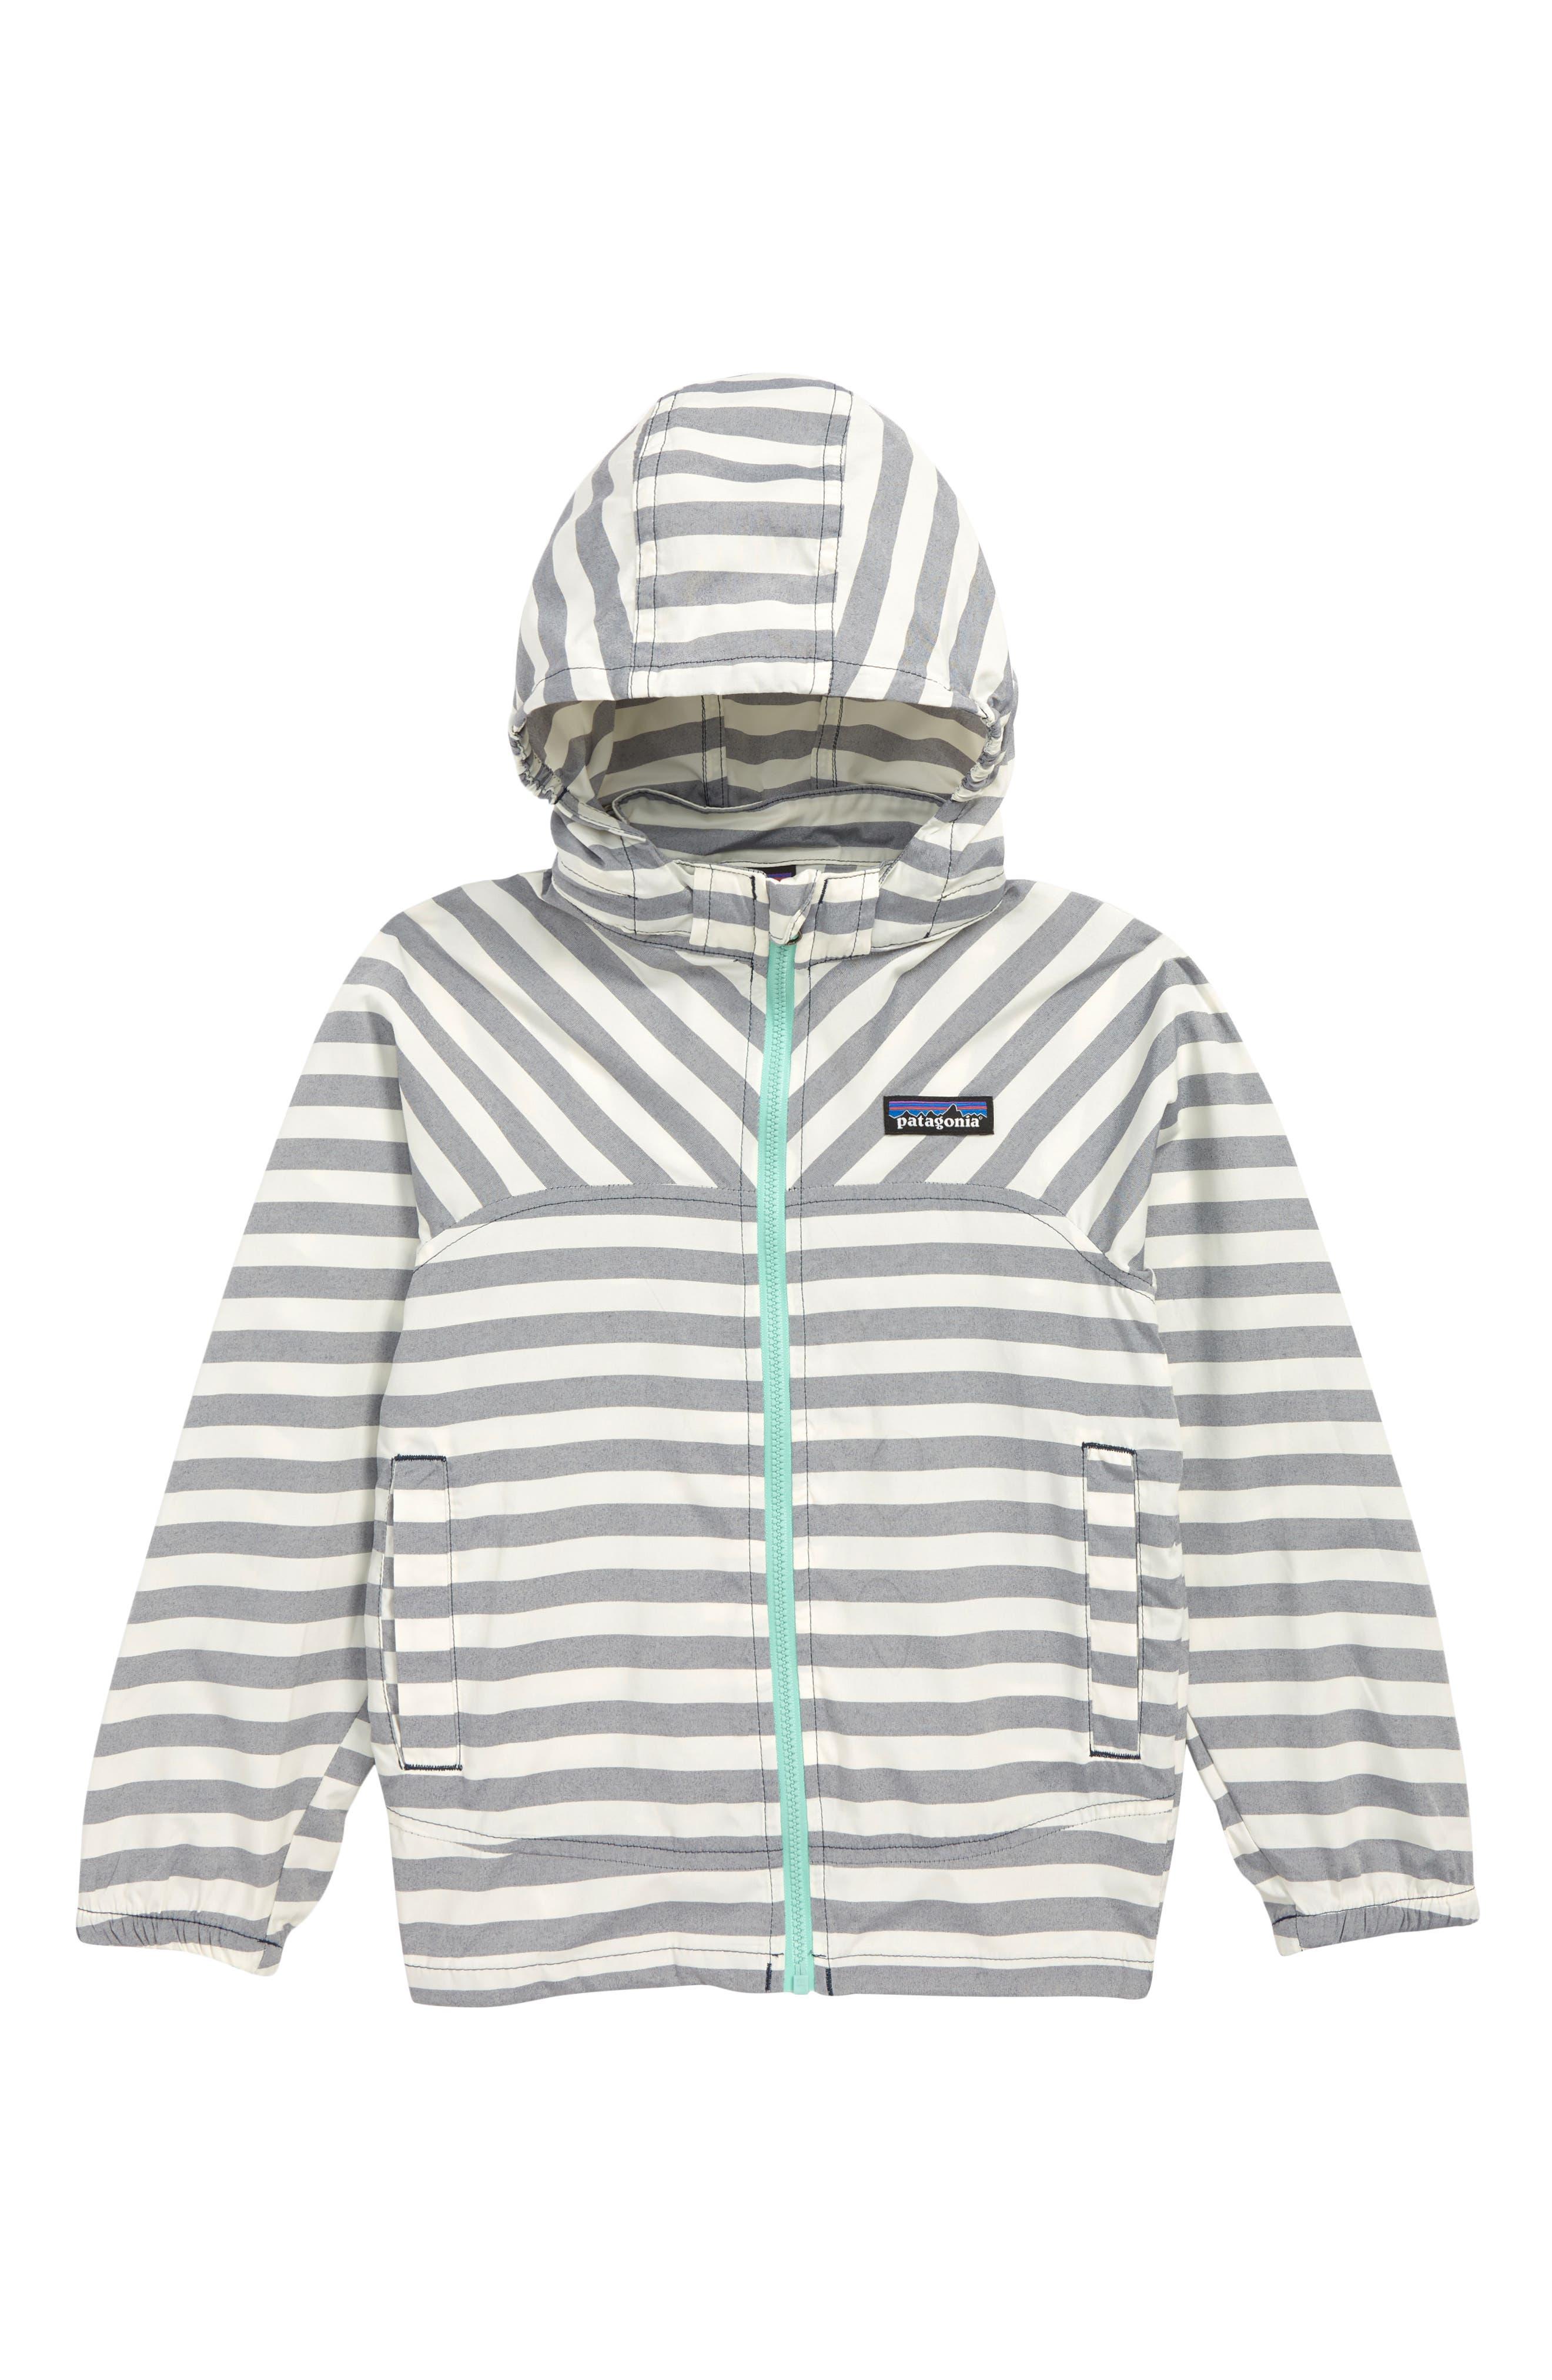 PATAGONIA, High Sun Hooded Windbreaker Jacket, Main thumbnail 1, color, STIX STRIPE/ NEO NAVY